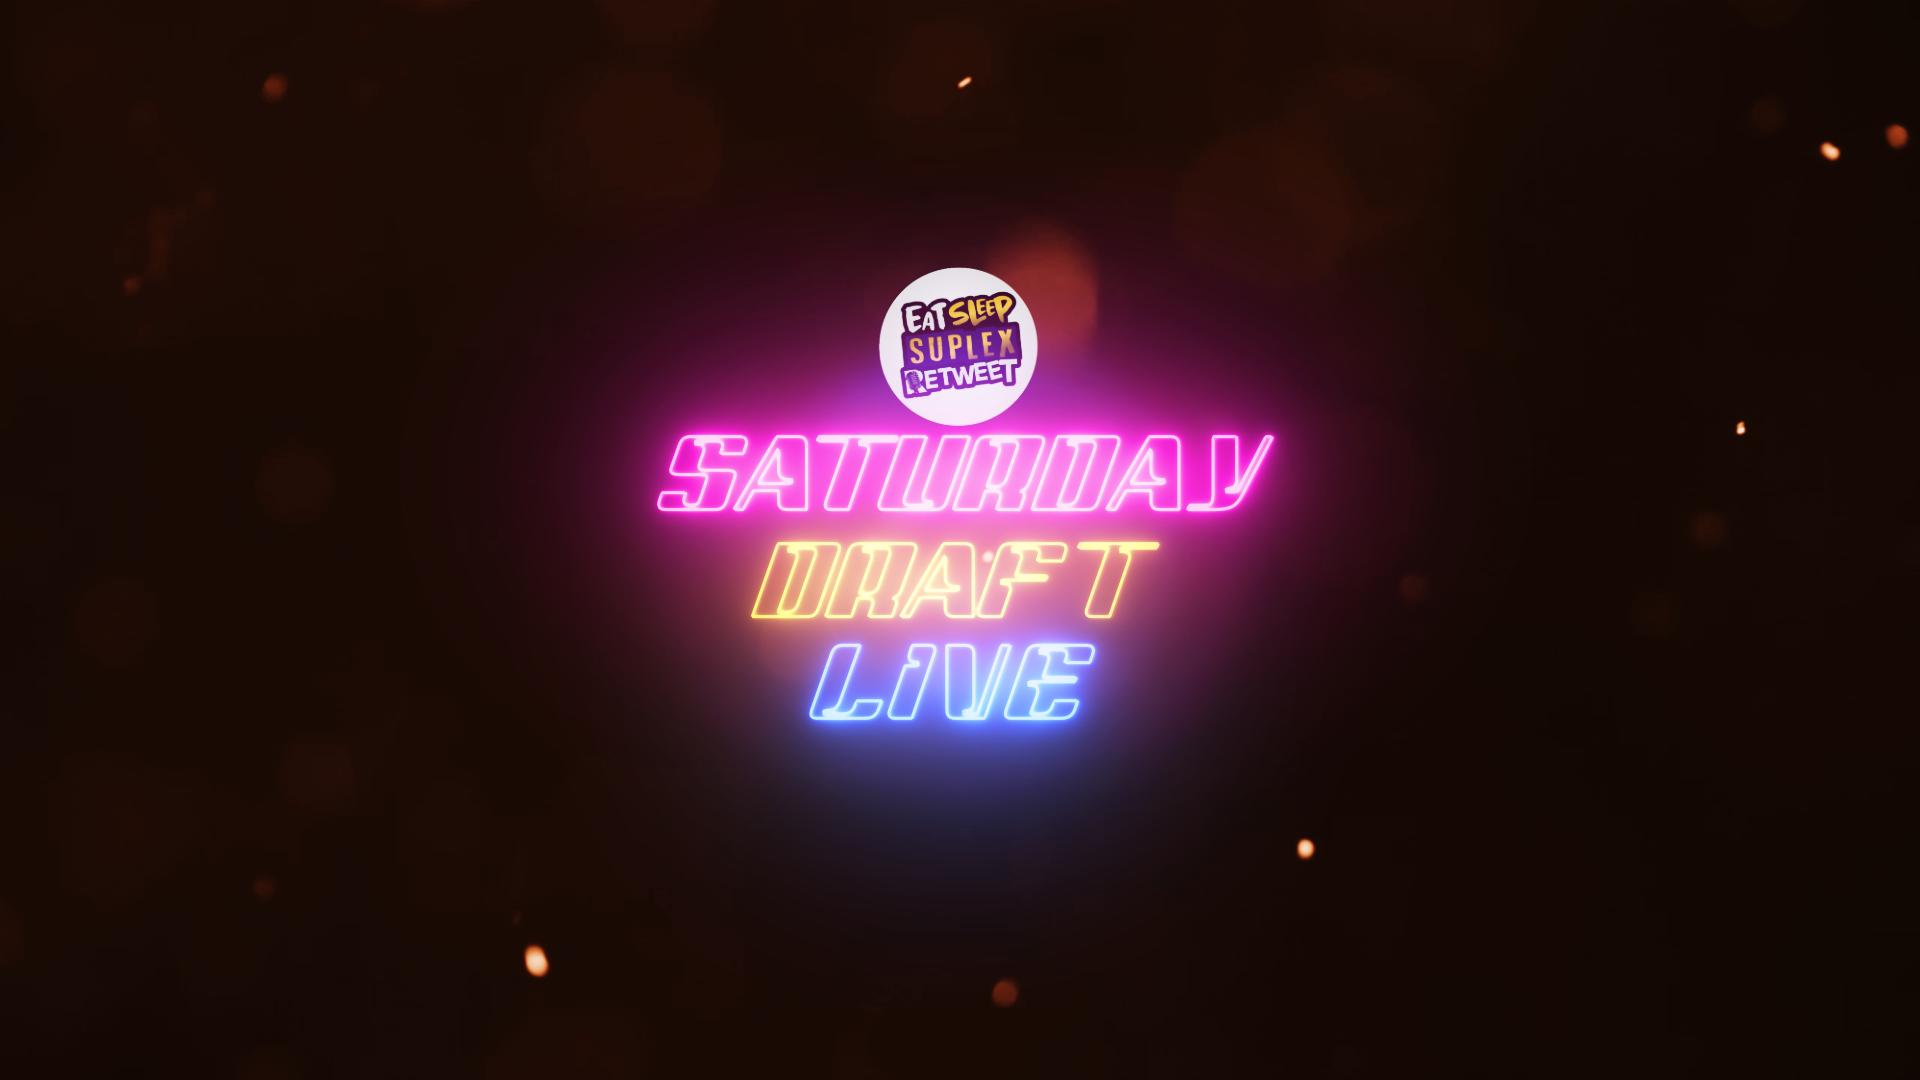 127035630 718461835463086 3387684810971786221 n - Saturday Draft Live